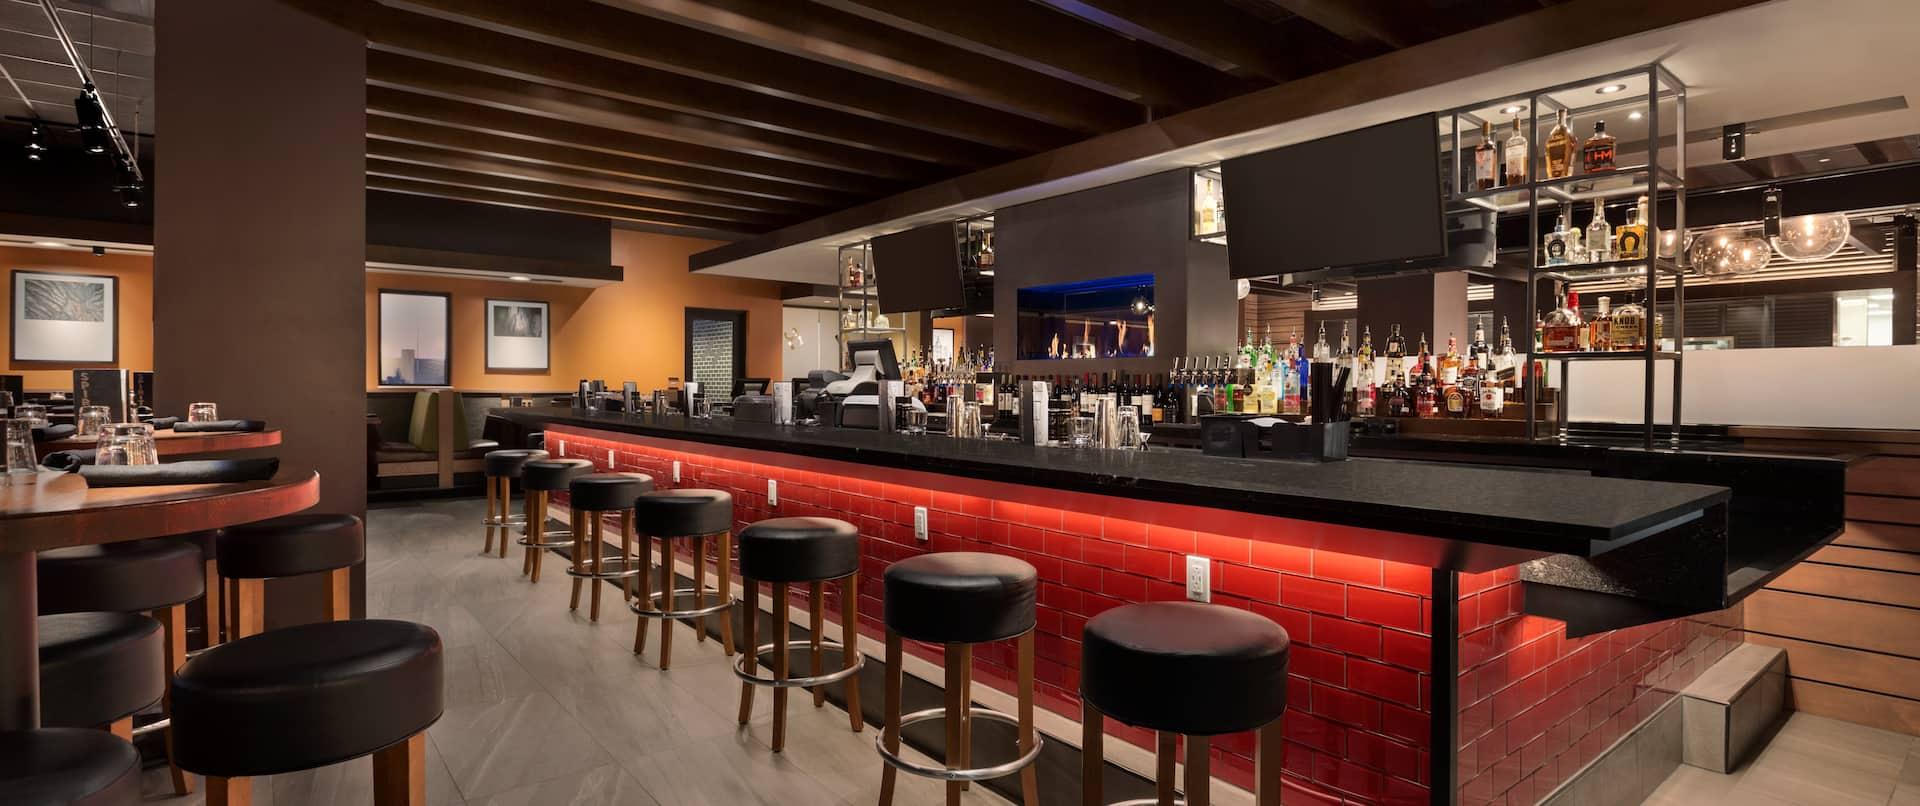 Houlihan's On-Site Restaurant Bar Area